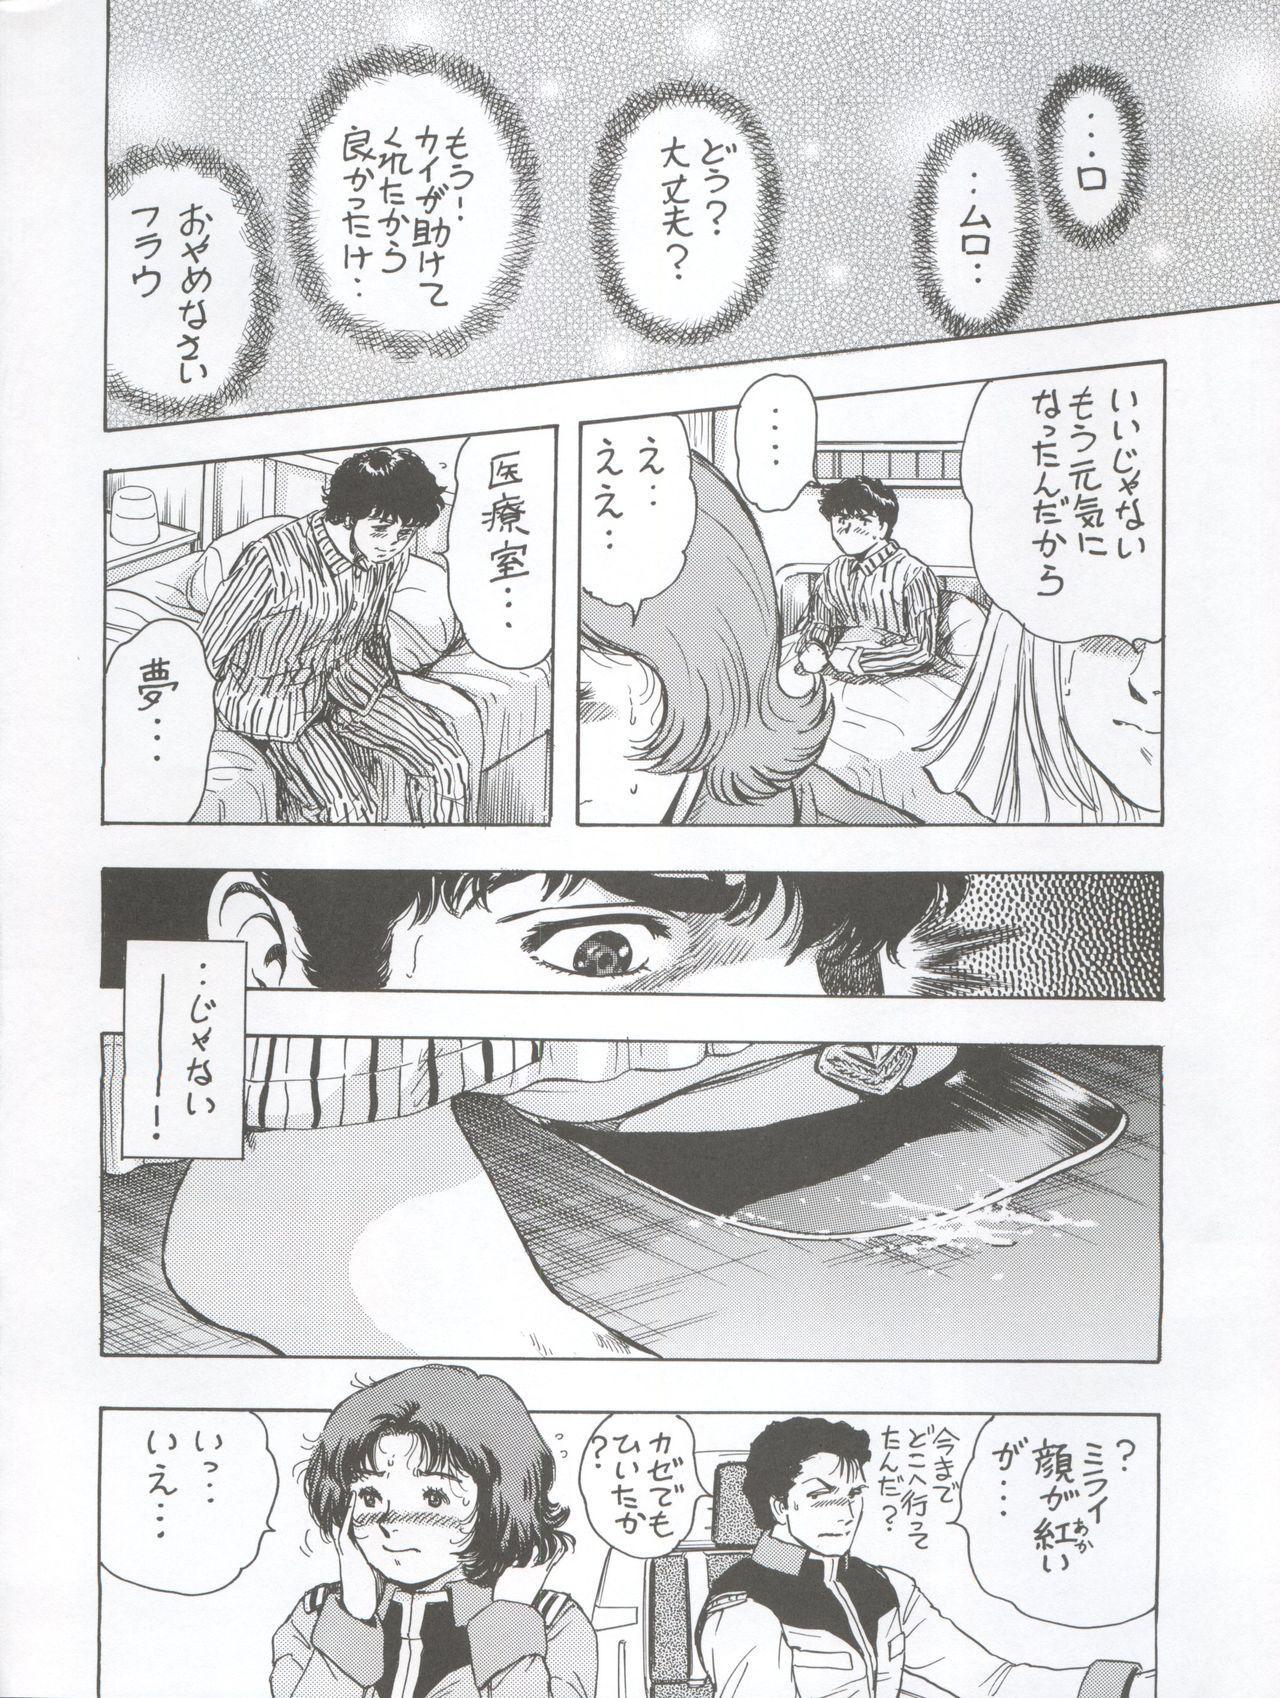 NEXT Climax Magazine 3 Gundam Series 19